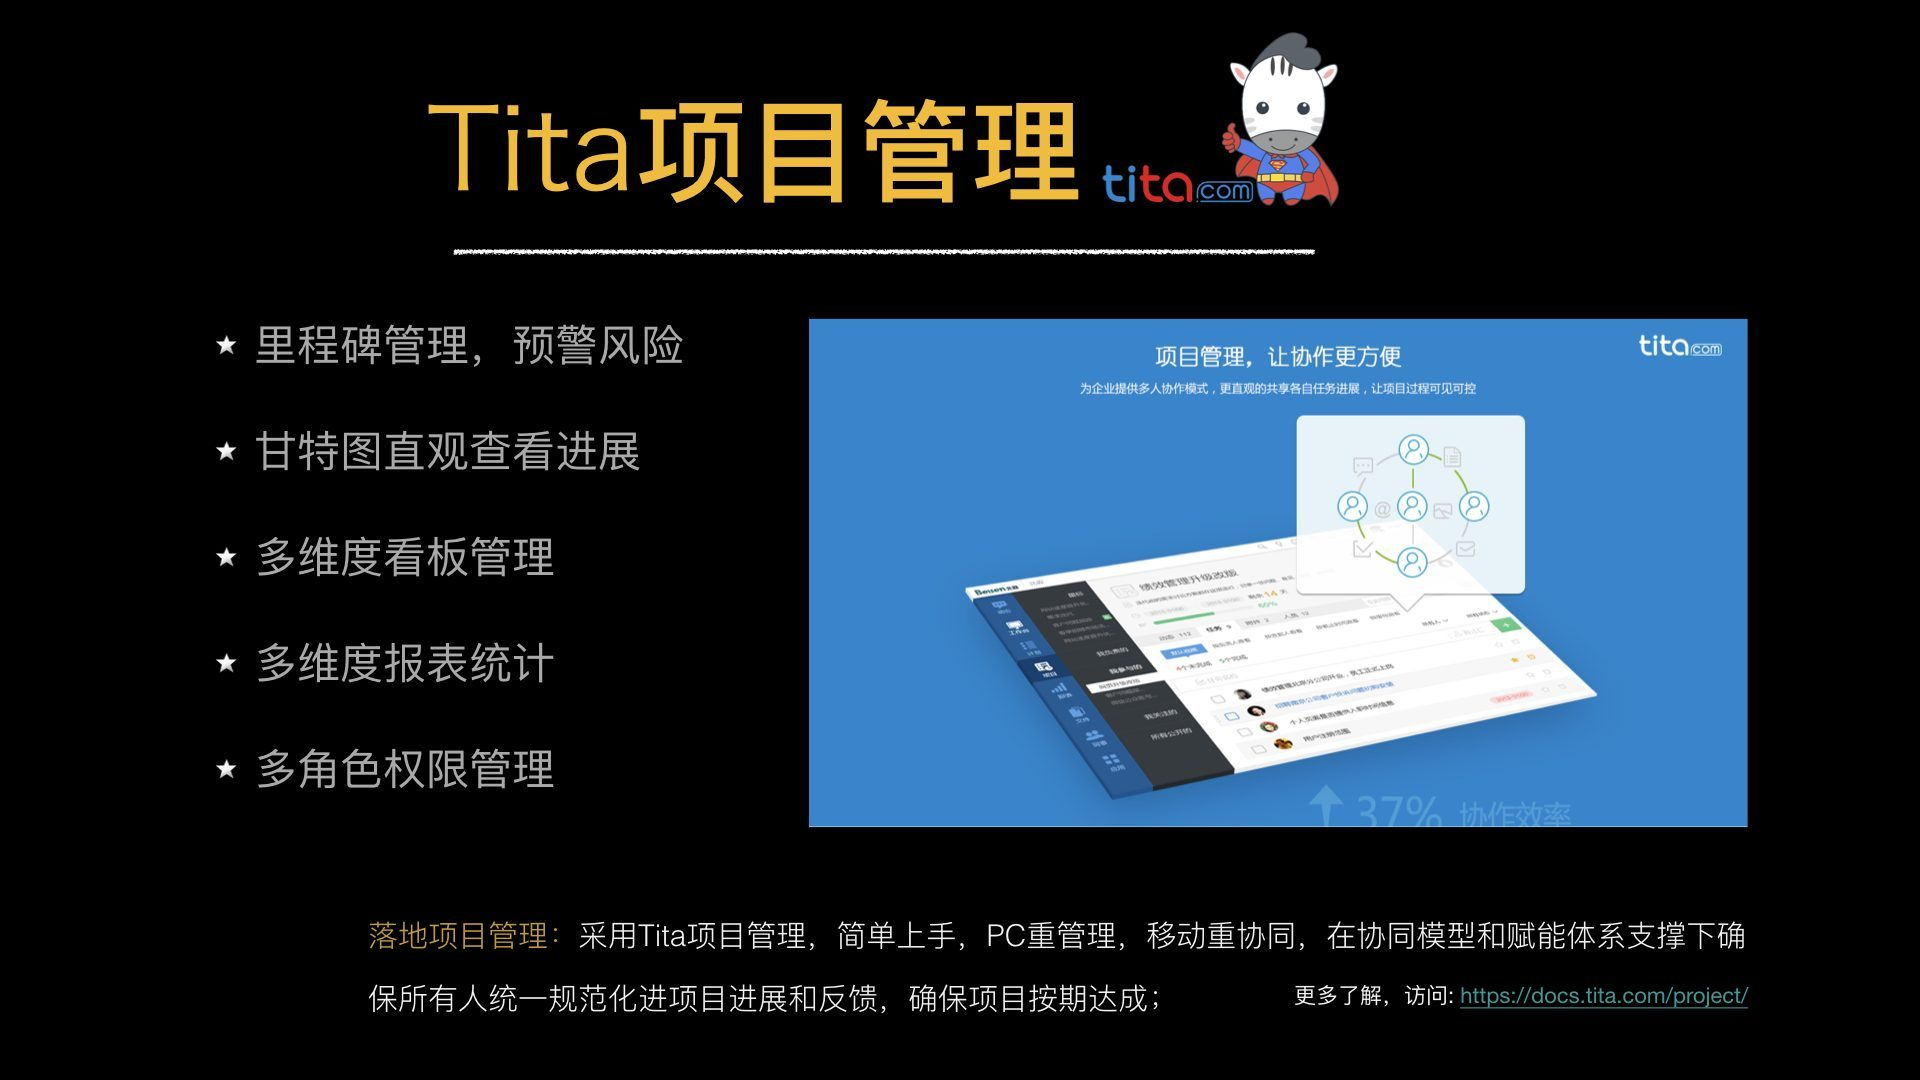 Tita|项目成员间的信息对称原来这么重要